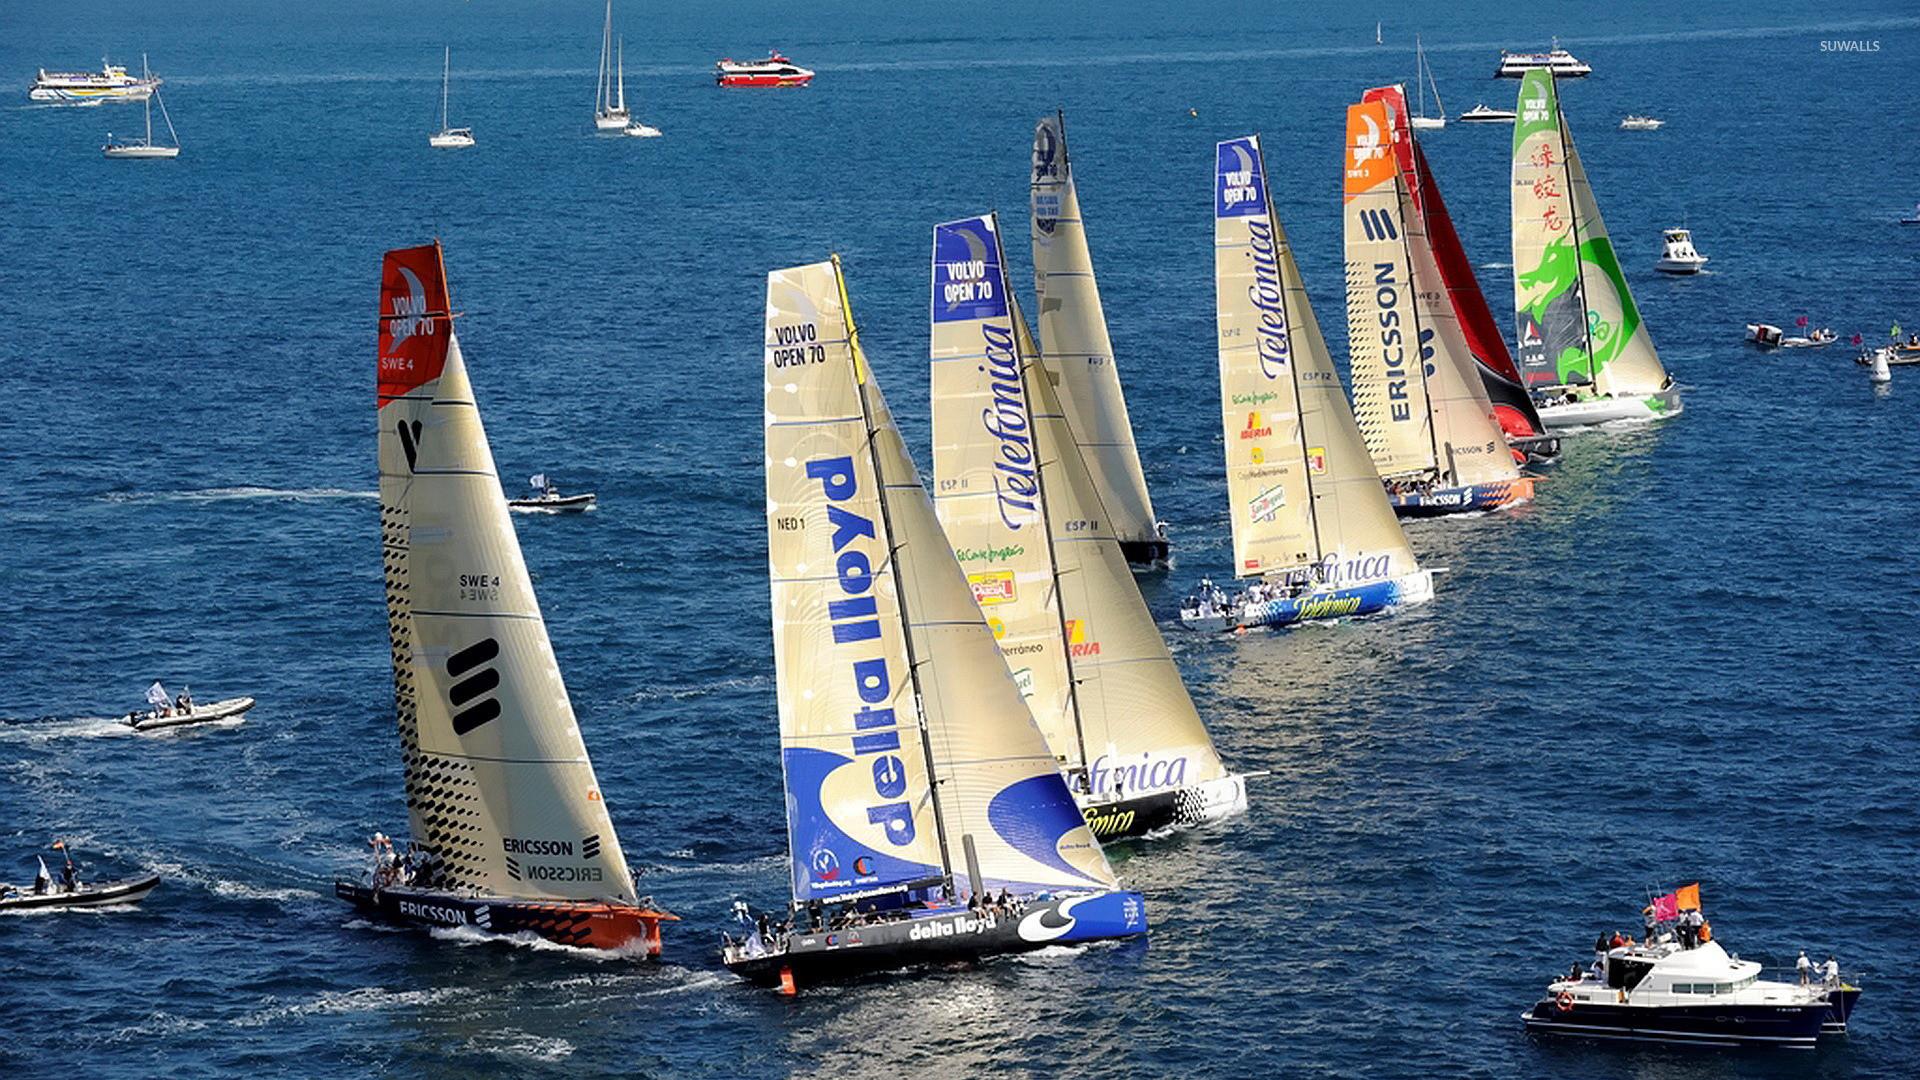 Racing Sailboat Wallpaper (67+ images)